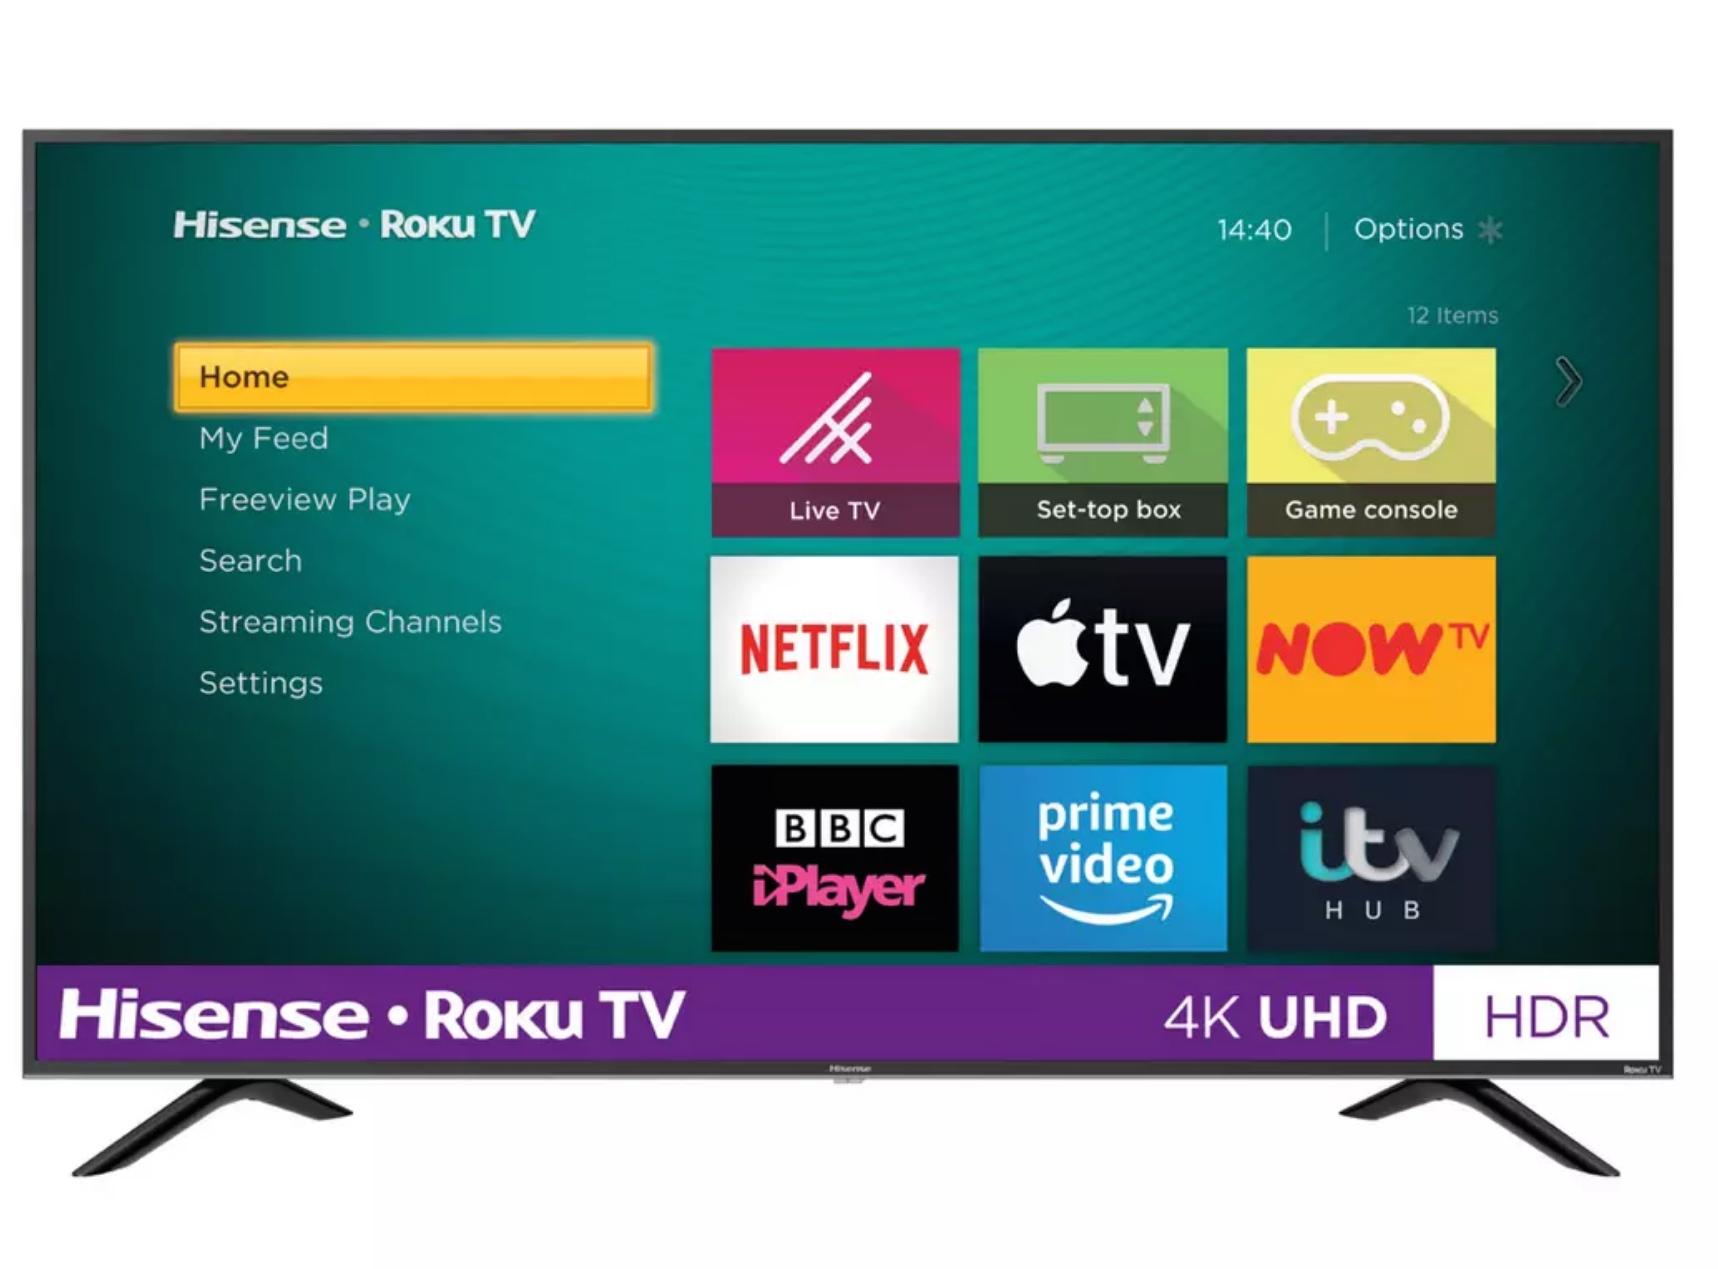 "Hisense Roku 4K Smart TV R43B7120UK 43"" - £245 / R50B7120UK 50"" - £299 / R55B7120UK 55"" £329 / R65B7120UK 65"" £449 @ Argos (click & collect)"